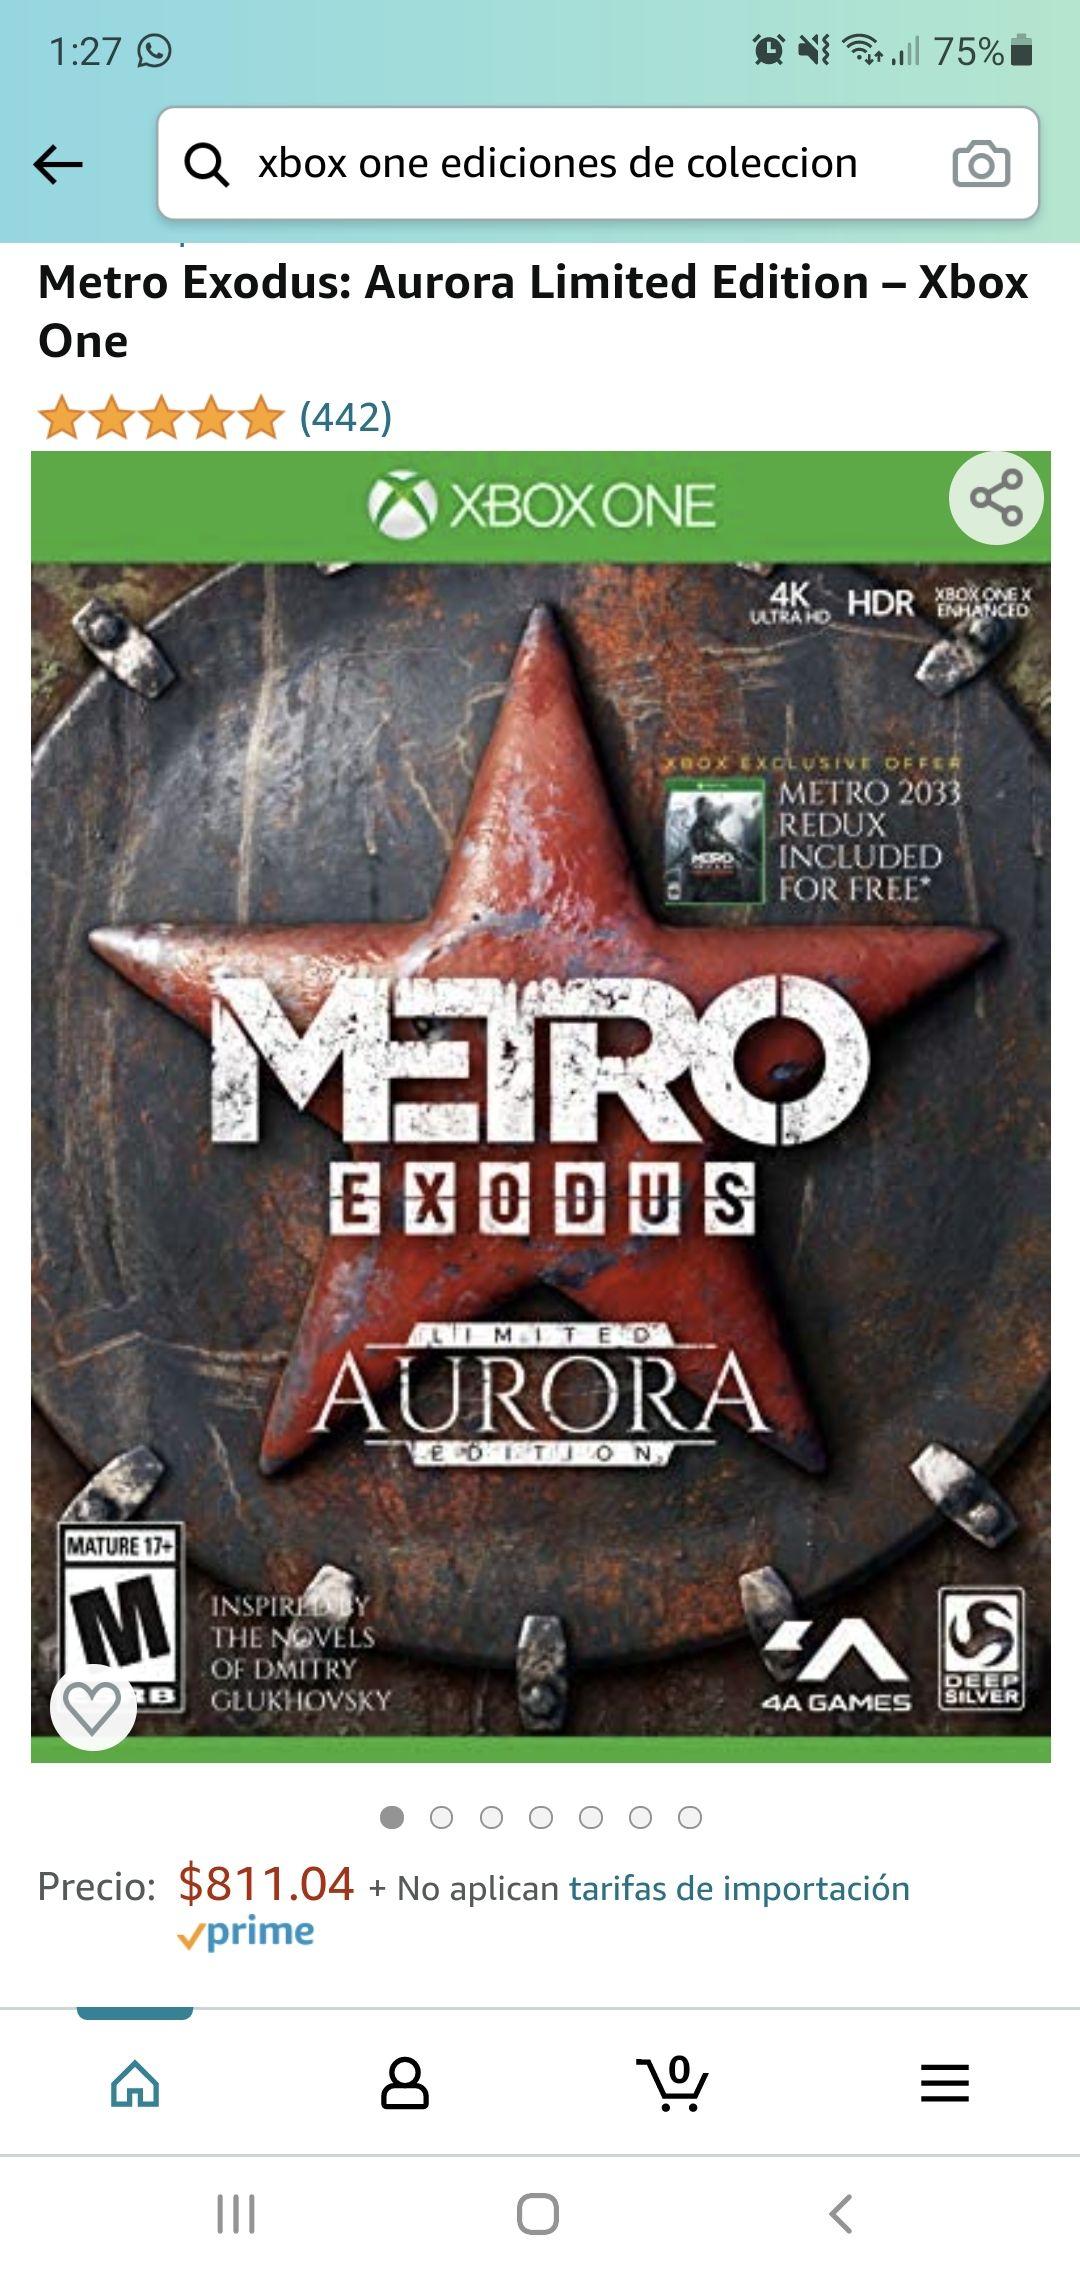 Amazon, Metro Exodus: Aurora Limited Edition - Xbox One